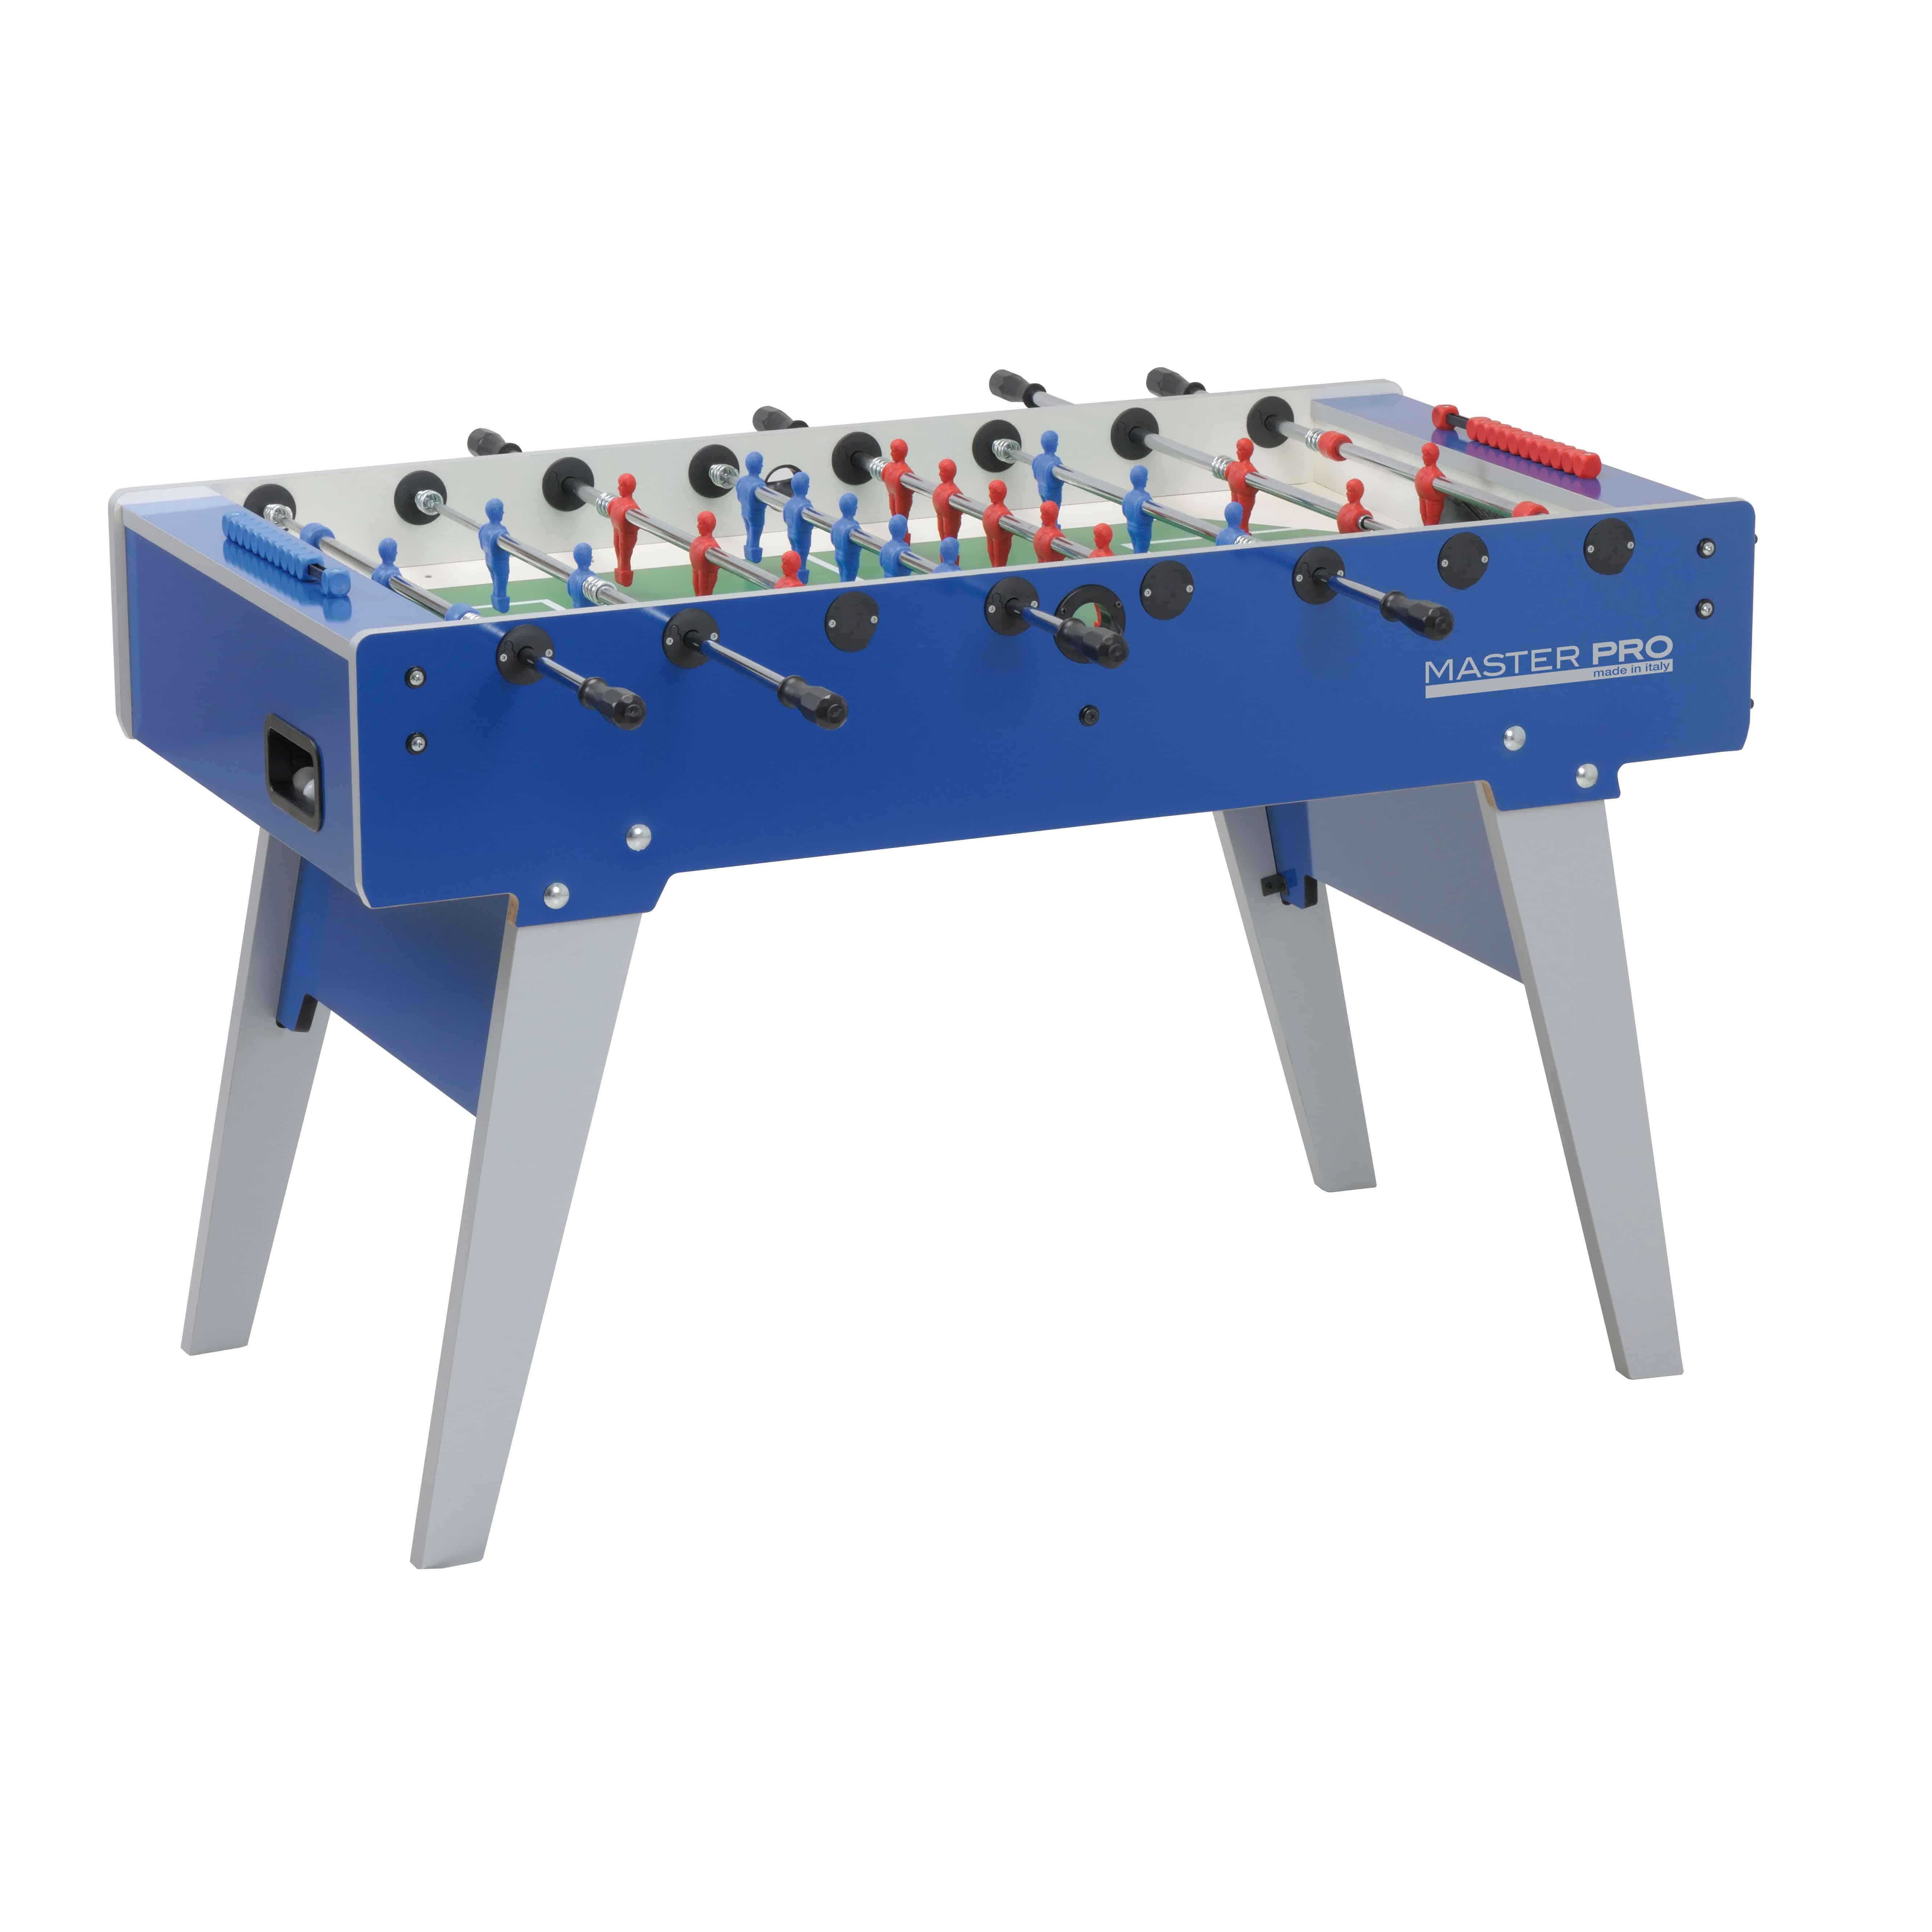 Garlando Master Pro Indoor Table Football Table